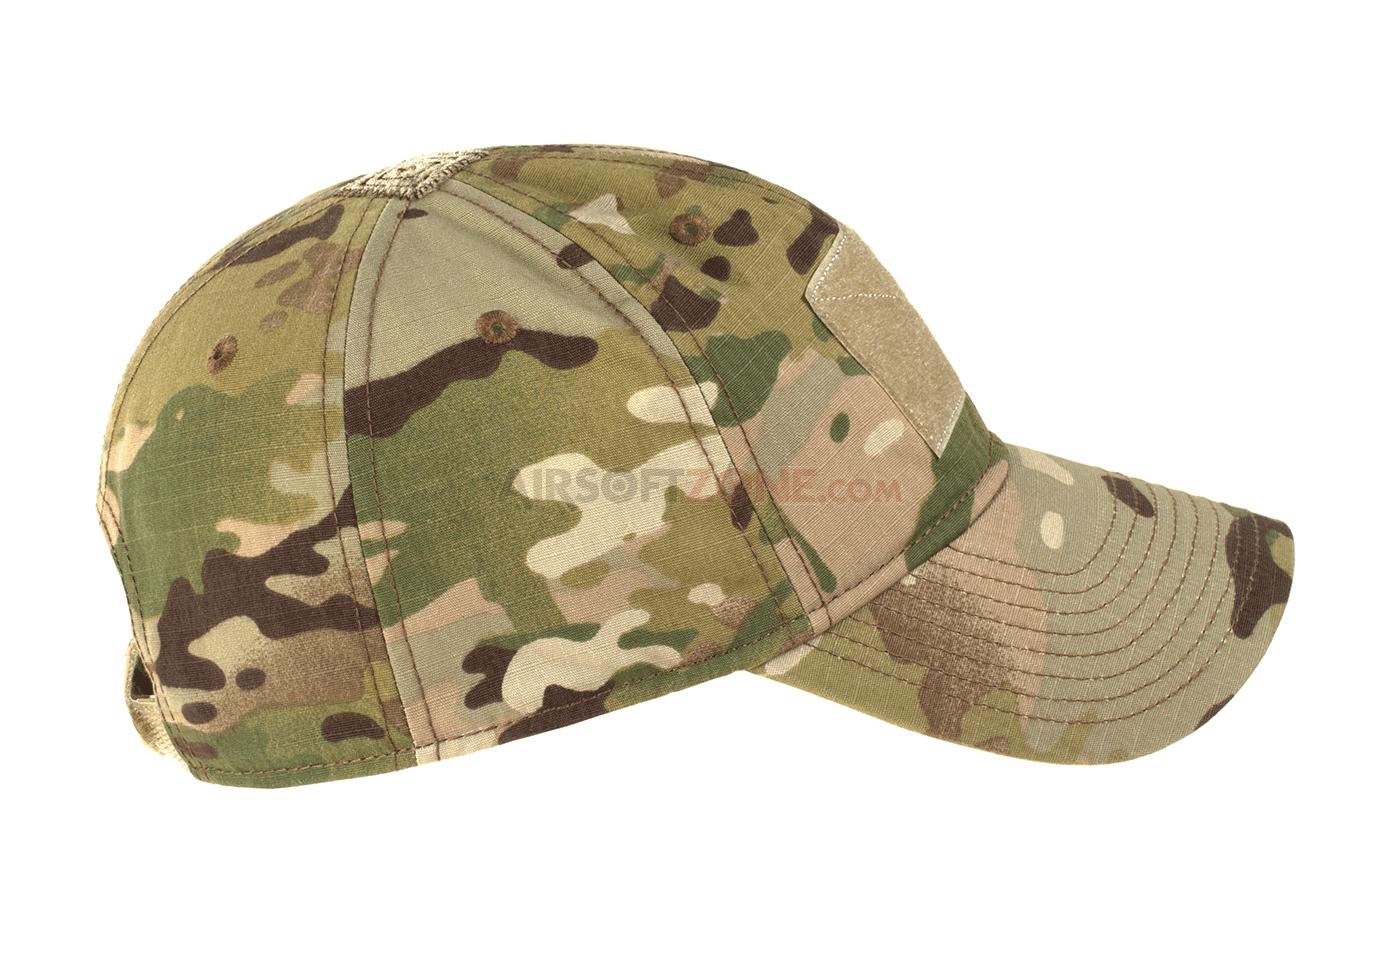 890d2d5aeb747 Flag Bearer Cap Multicam (5.11 Tactical) - Caps - Kopfbedeckungen -  Bekleidung - airsoftzone.at Onlineshop